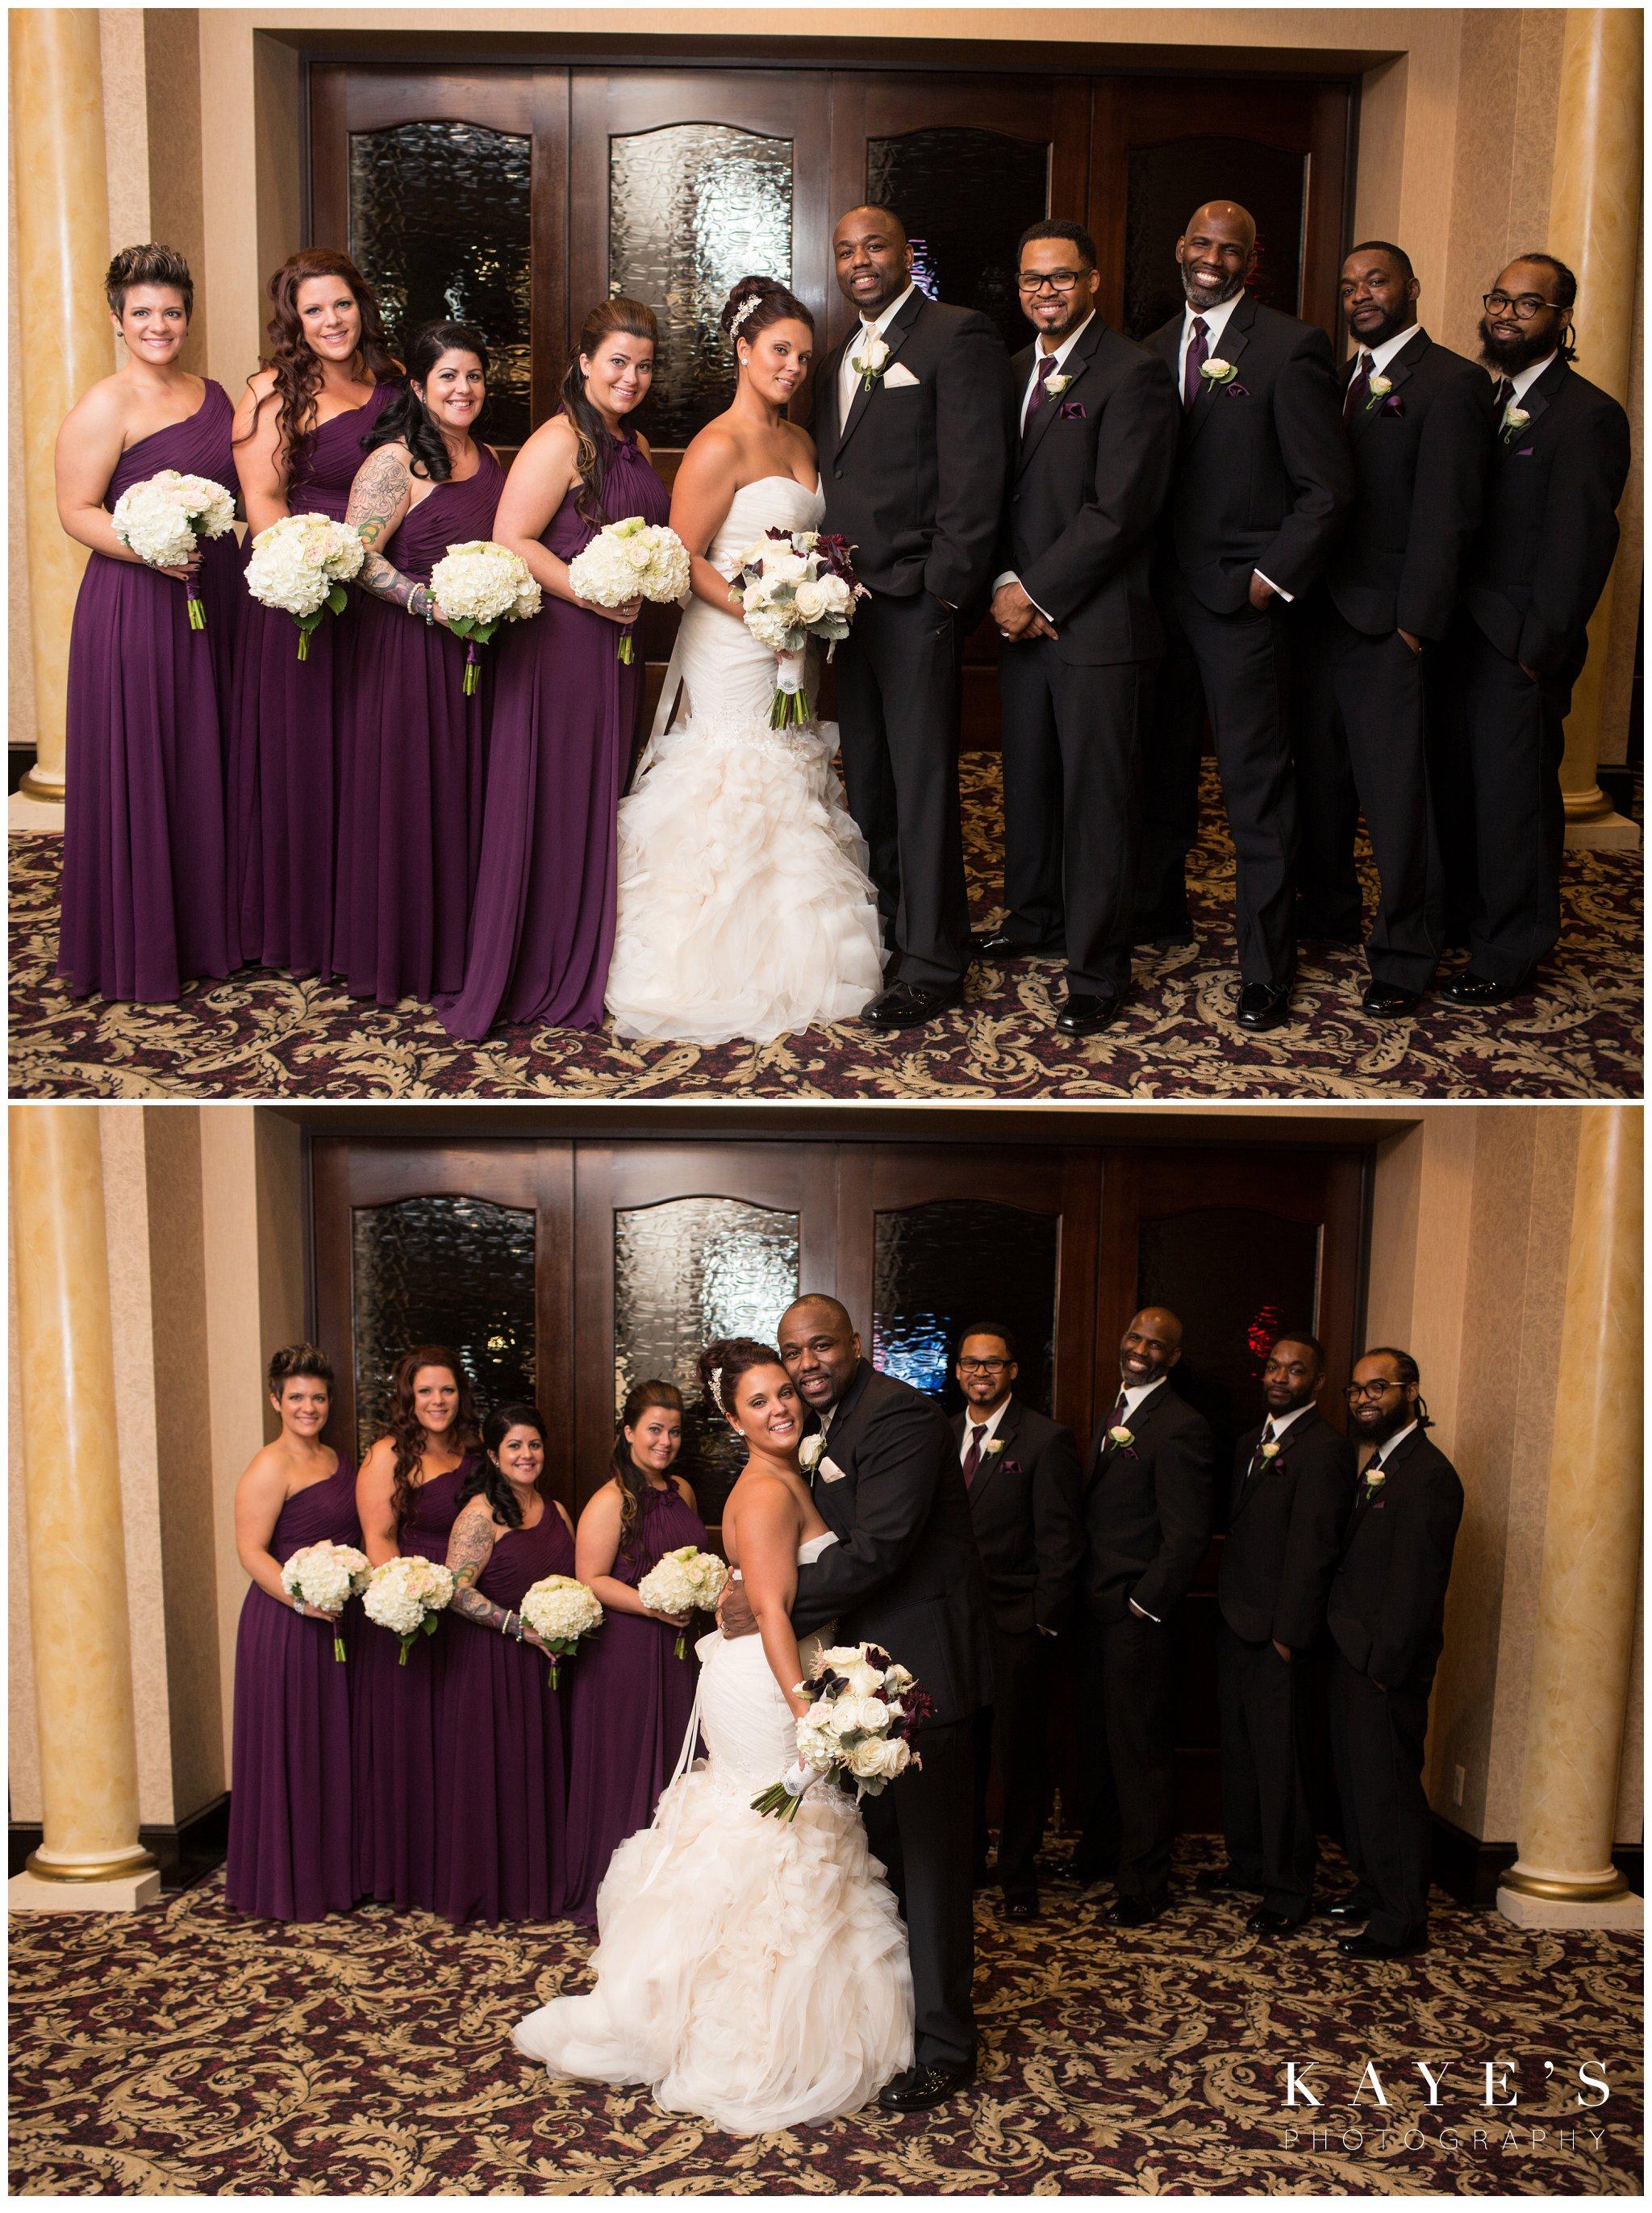 Kayes Photography- howell-michigan-wedding-photographer_0654.jpg